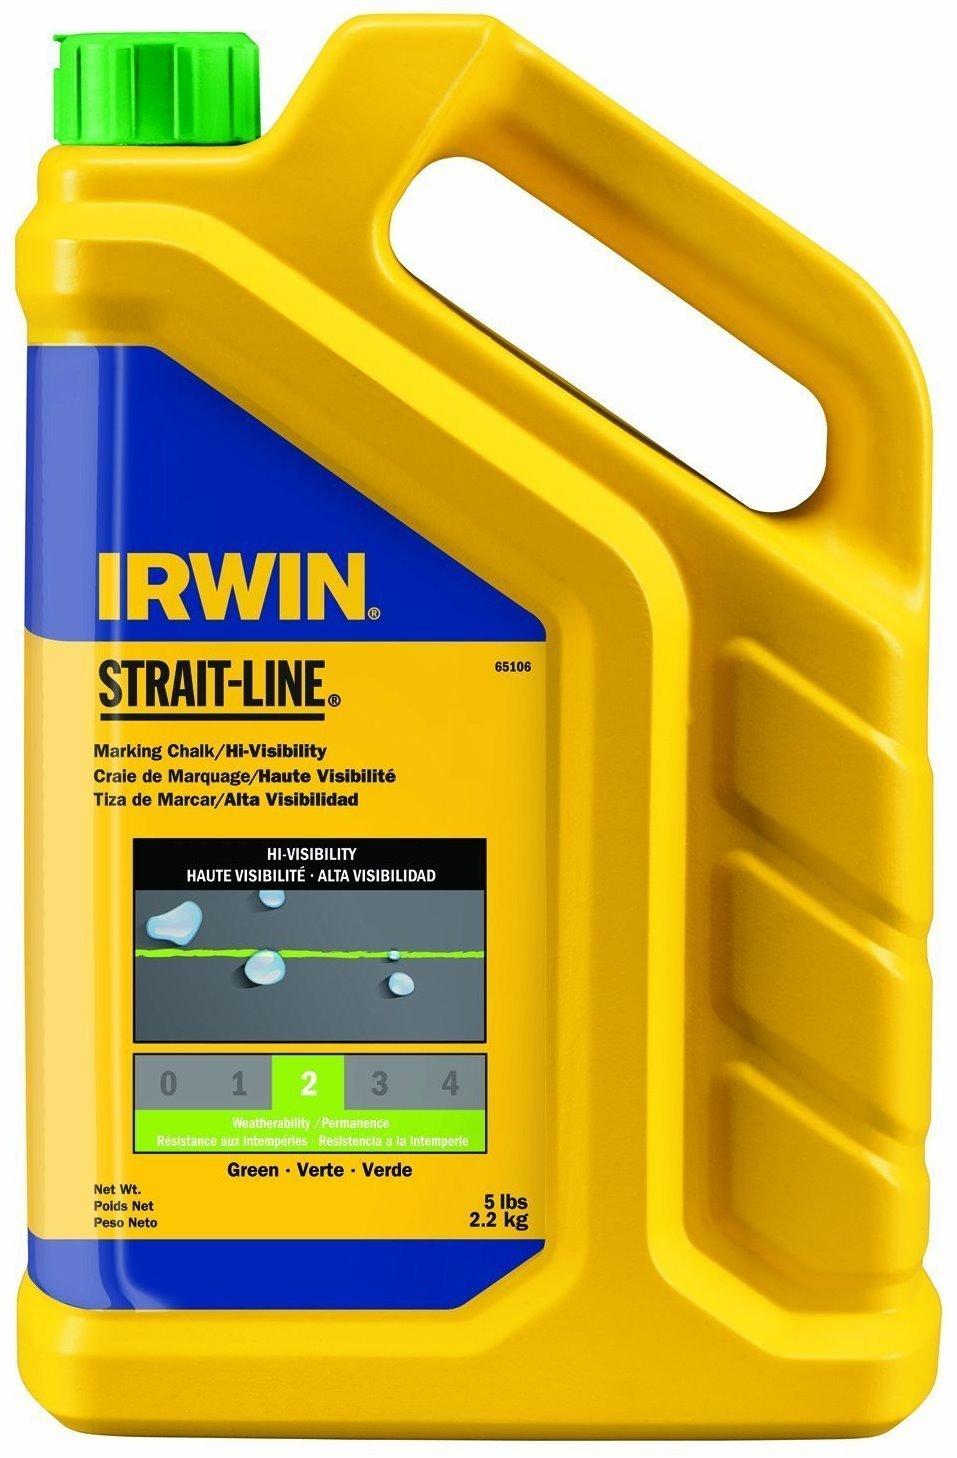 4 Pack Irwin 65106 Strait-Line 5lb Hi-Visibility Marking Chalk - Fluorescent Green (Lime)